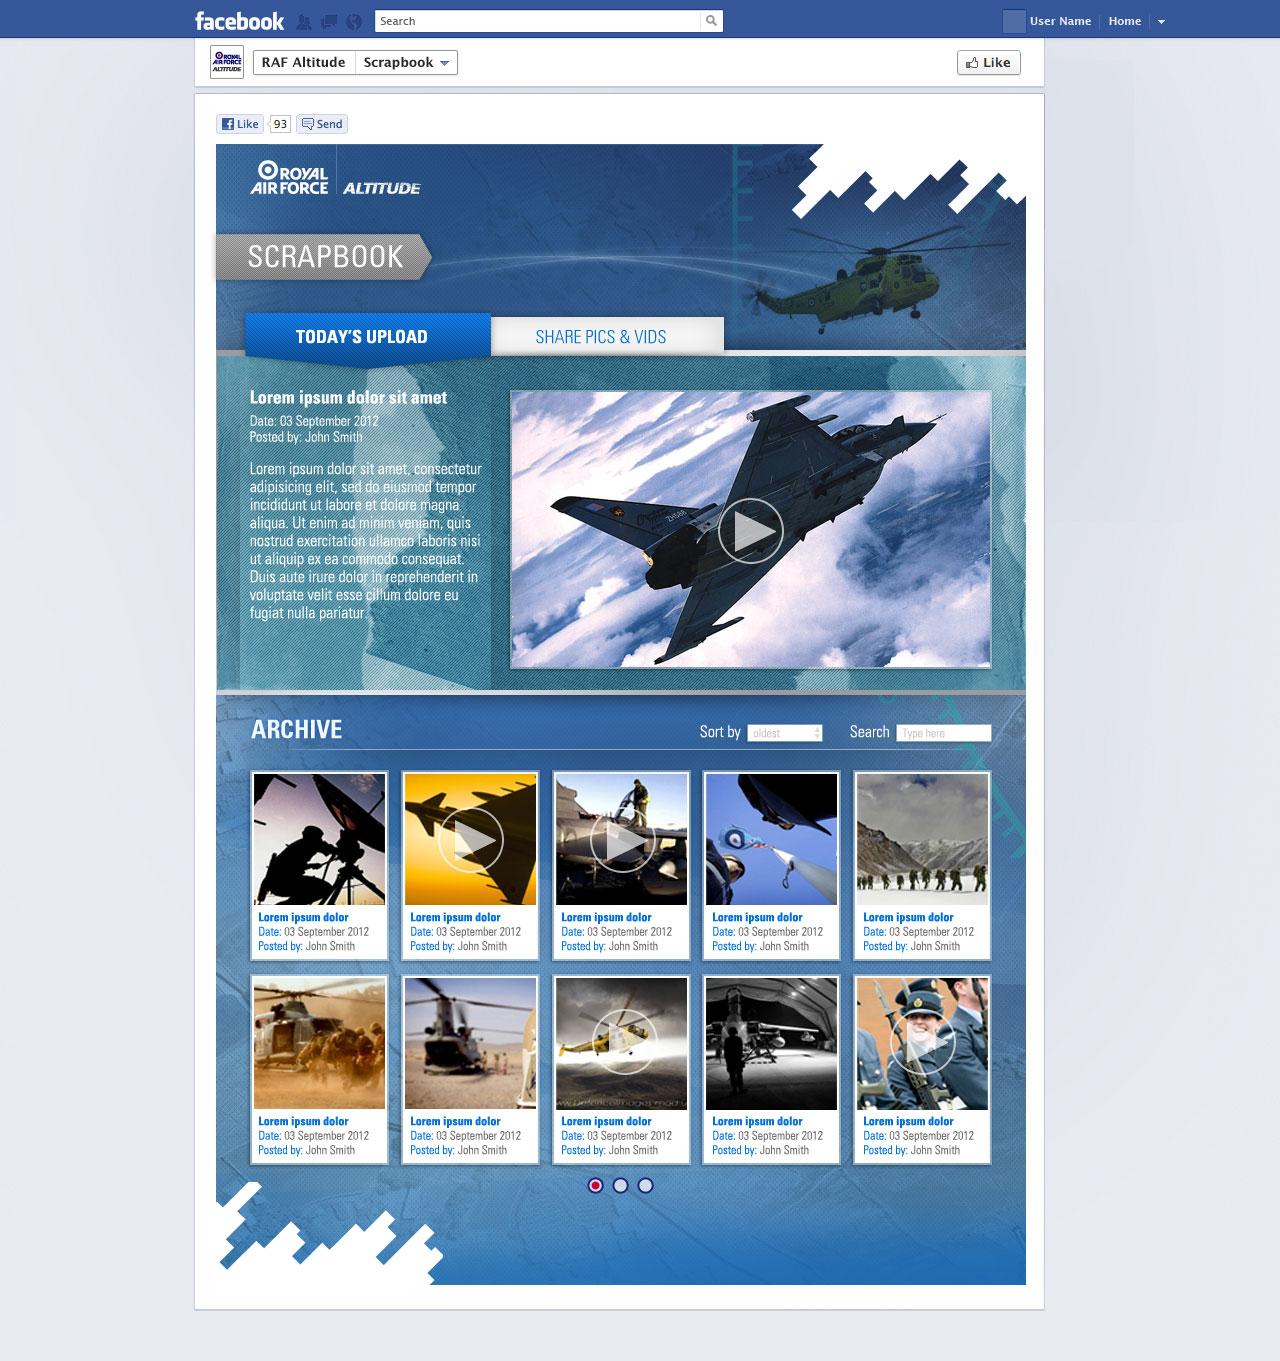 RAF_Altitude_ScrapBook